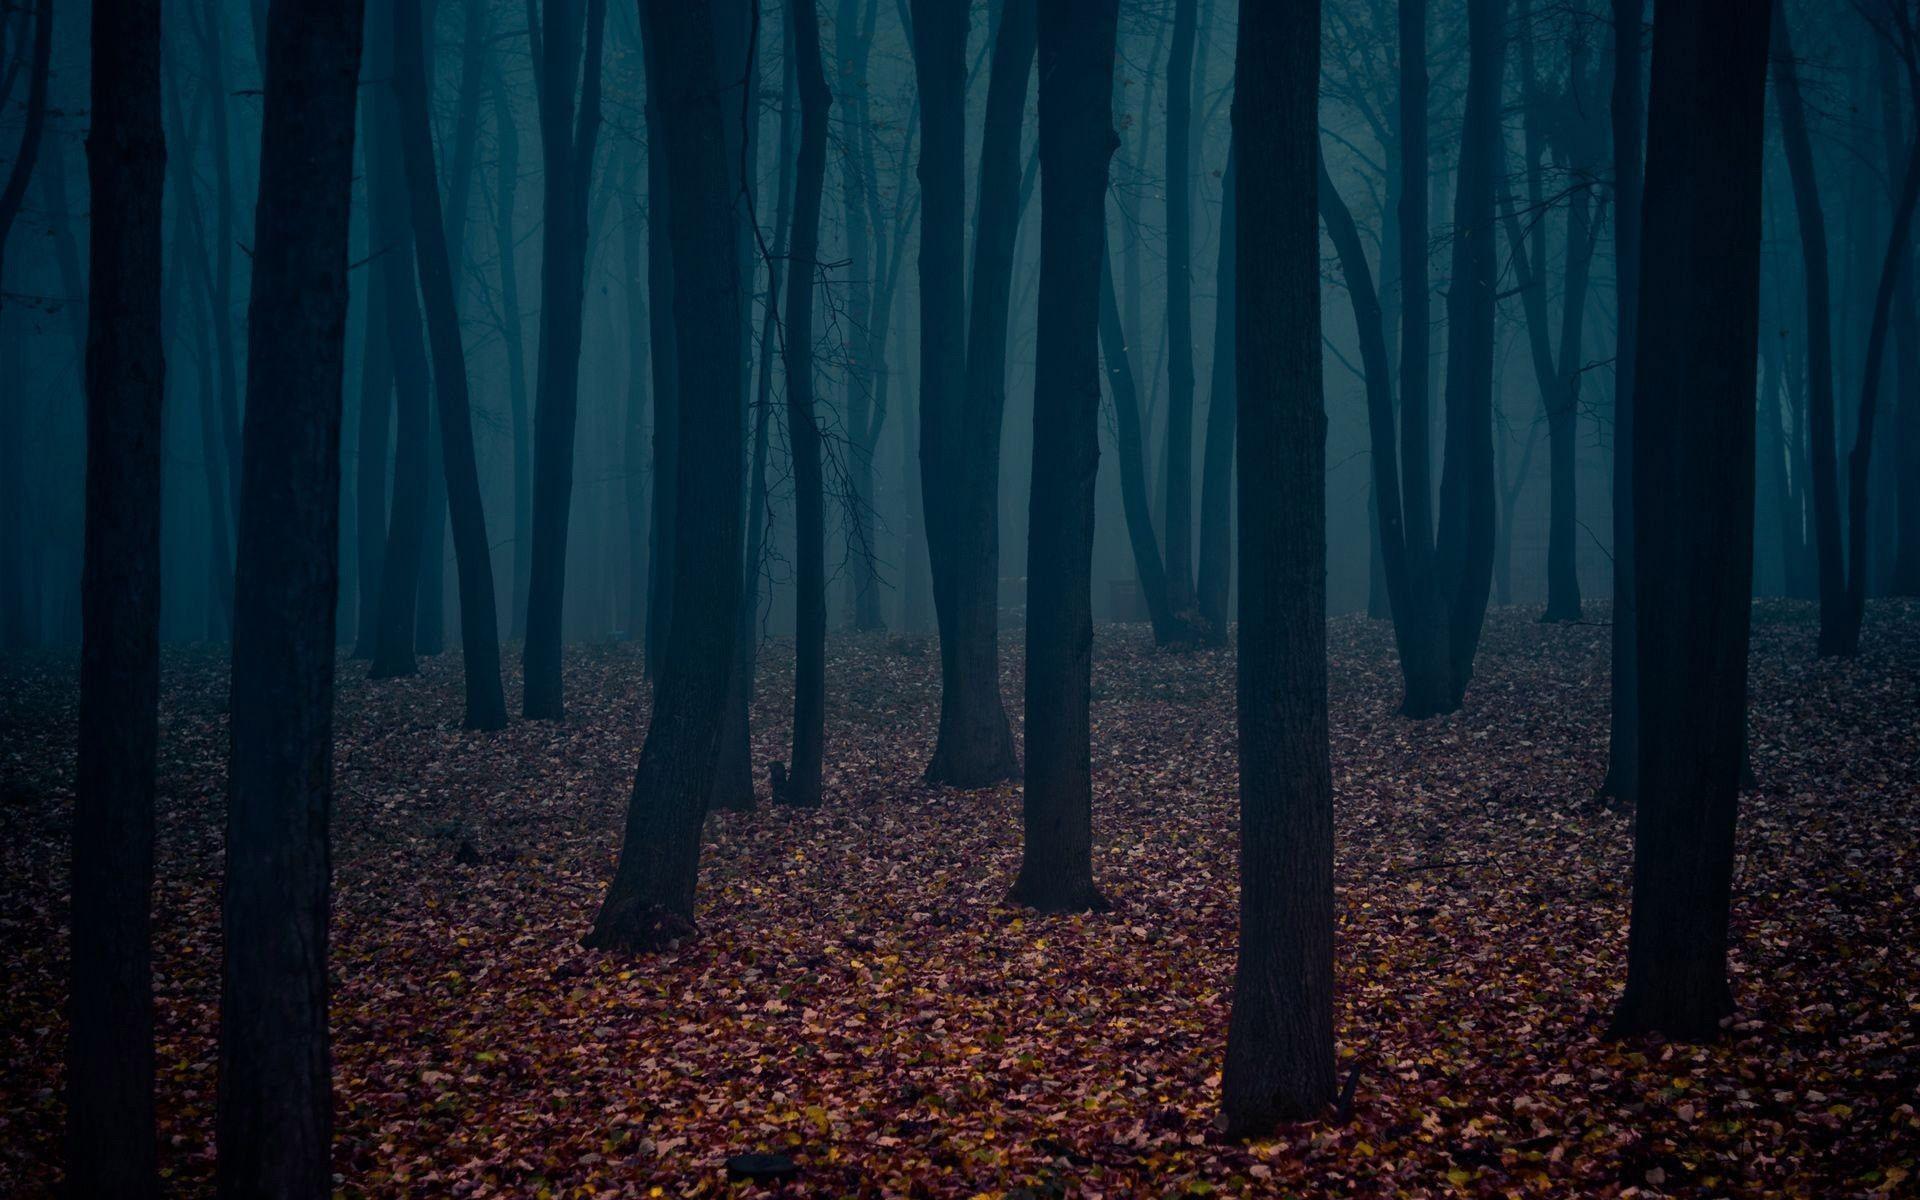 Dark Forest Wallpaper High Quality Resolution